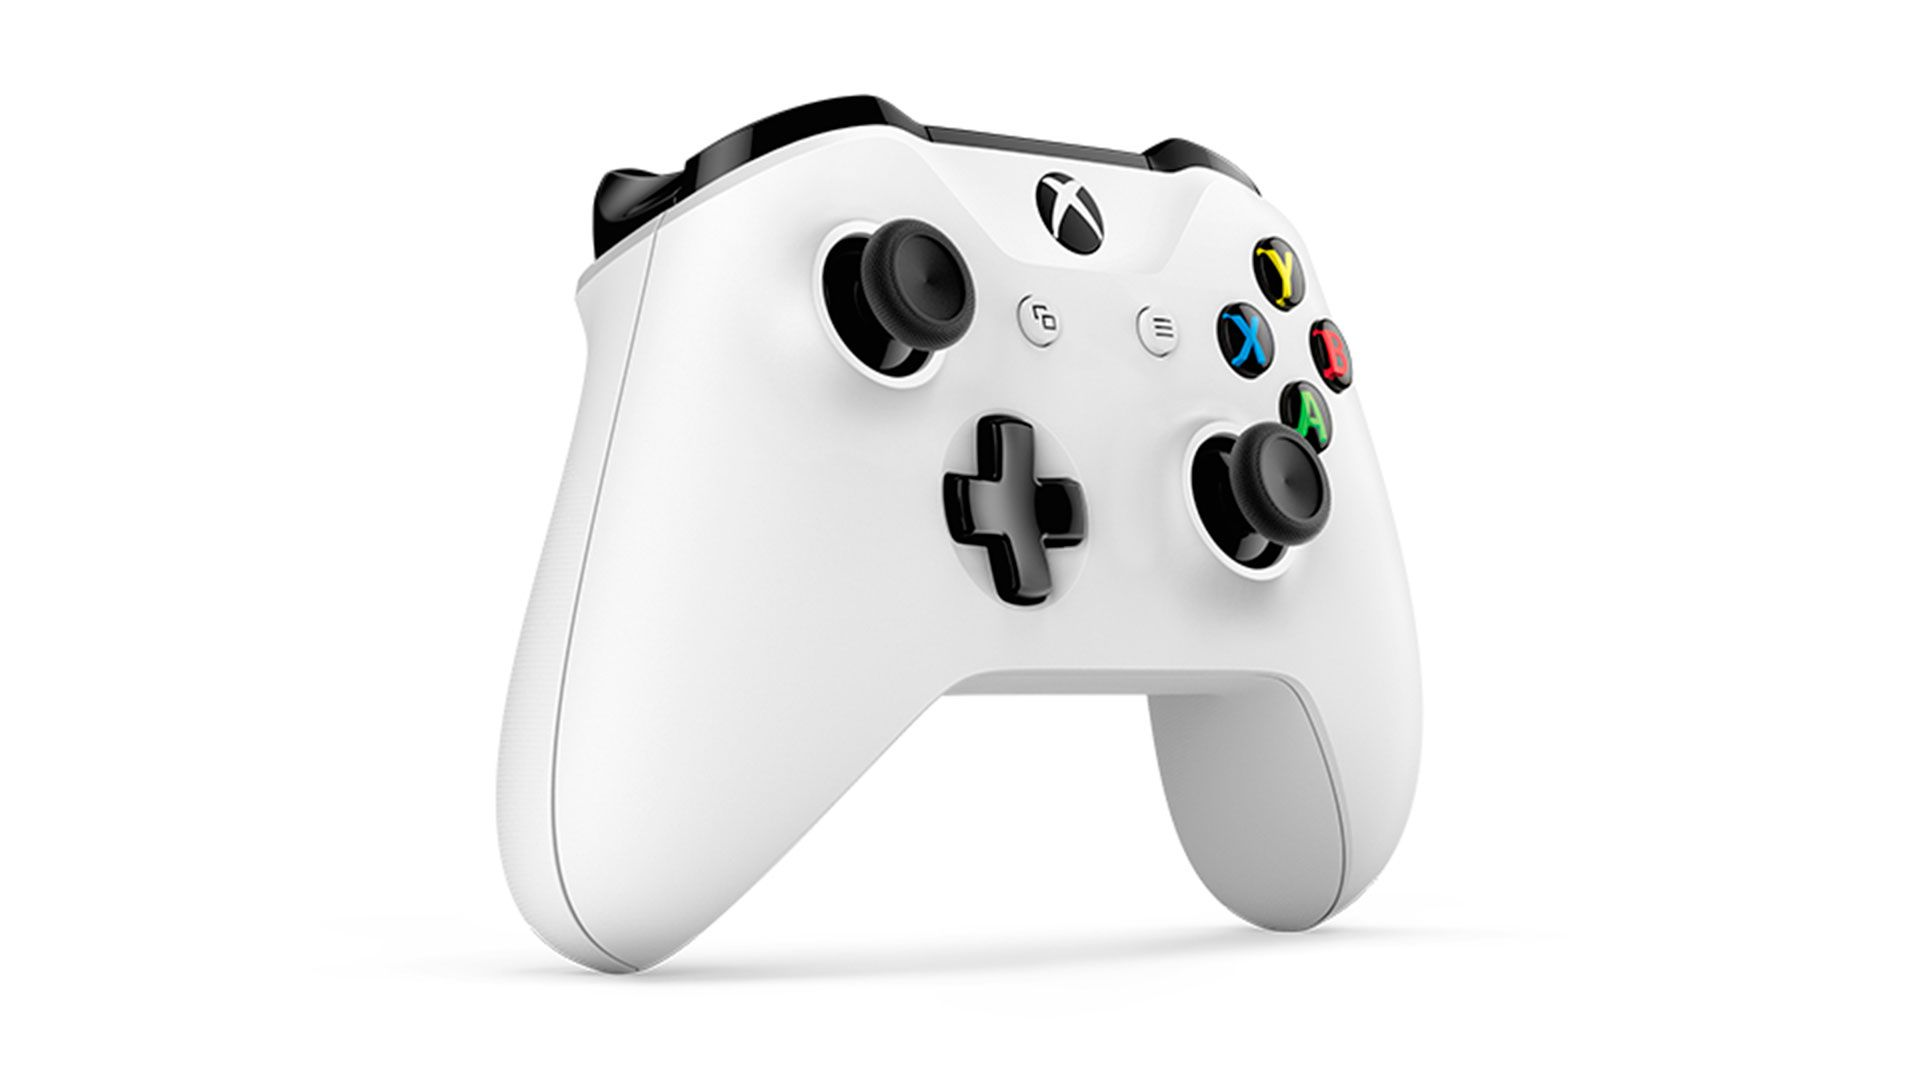 Xbox One белый геймпад изображение 1